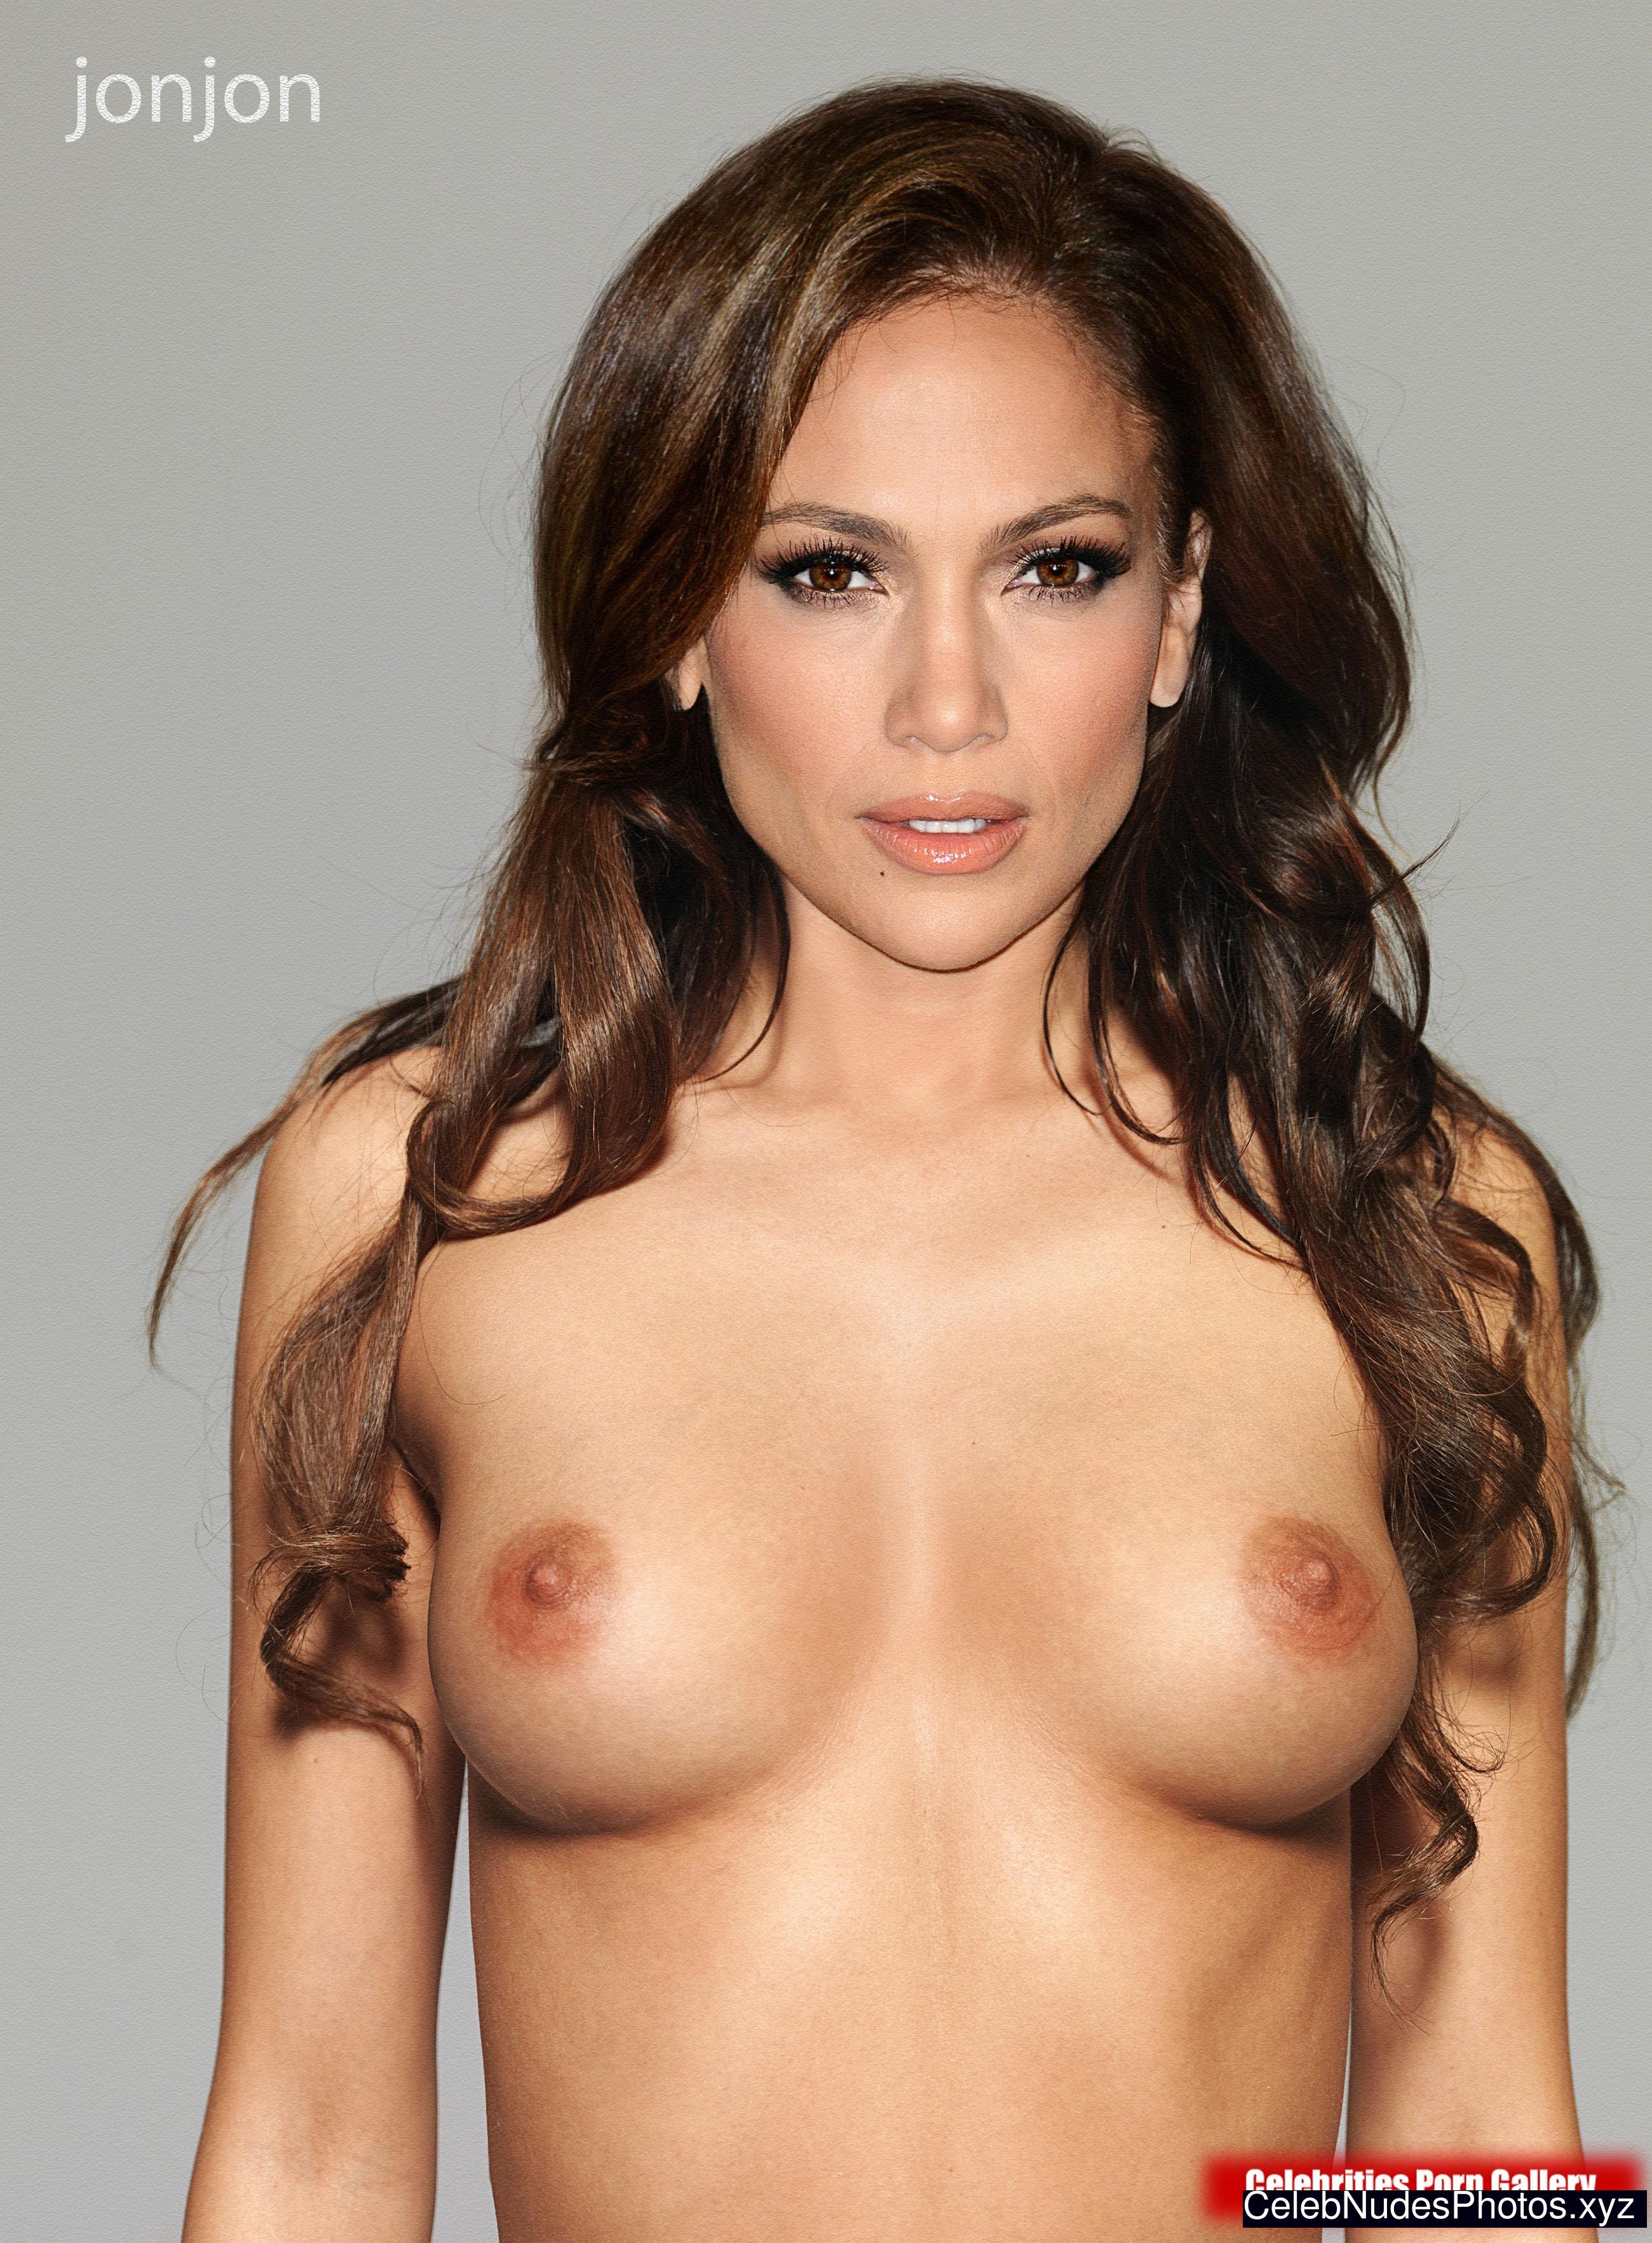 Nudes celeb Celebrities Who